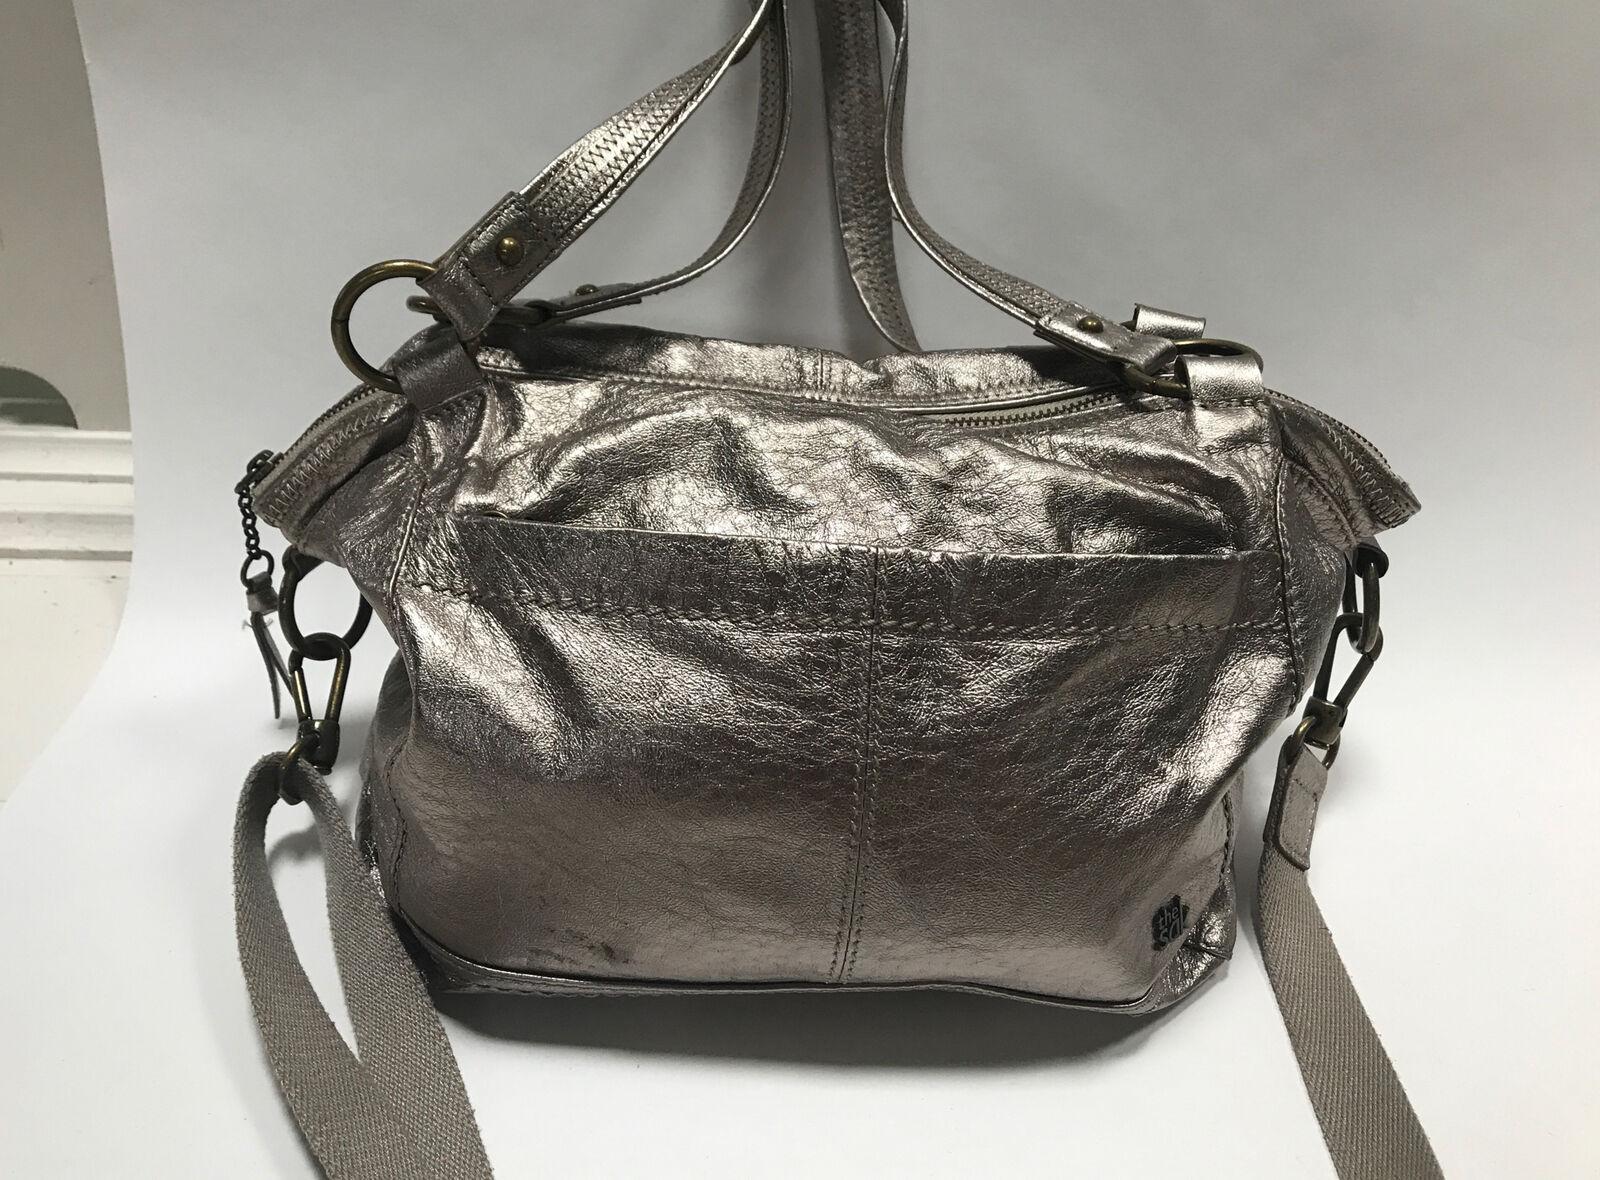 The Sak Gold/Bronze Pebbled Leather Shoulder Bag with Detachable Crossbody Strap